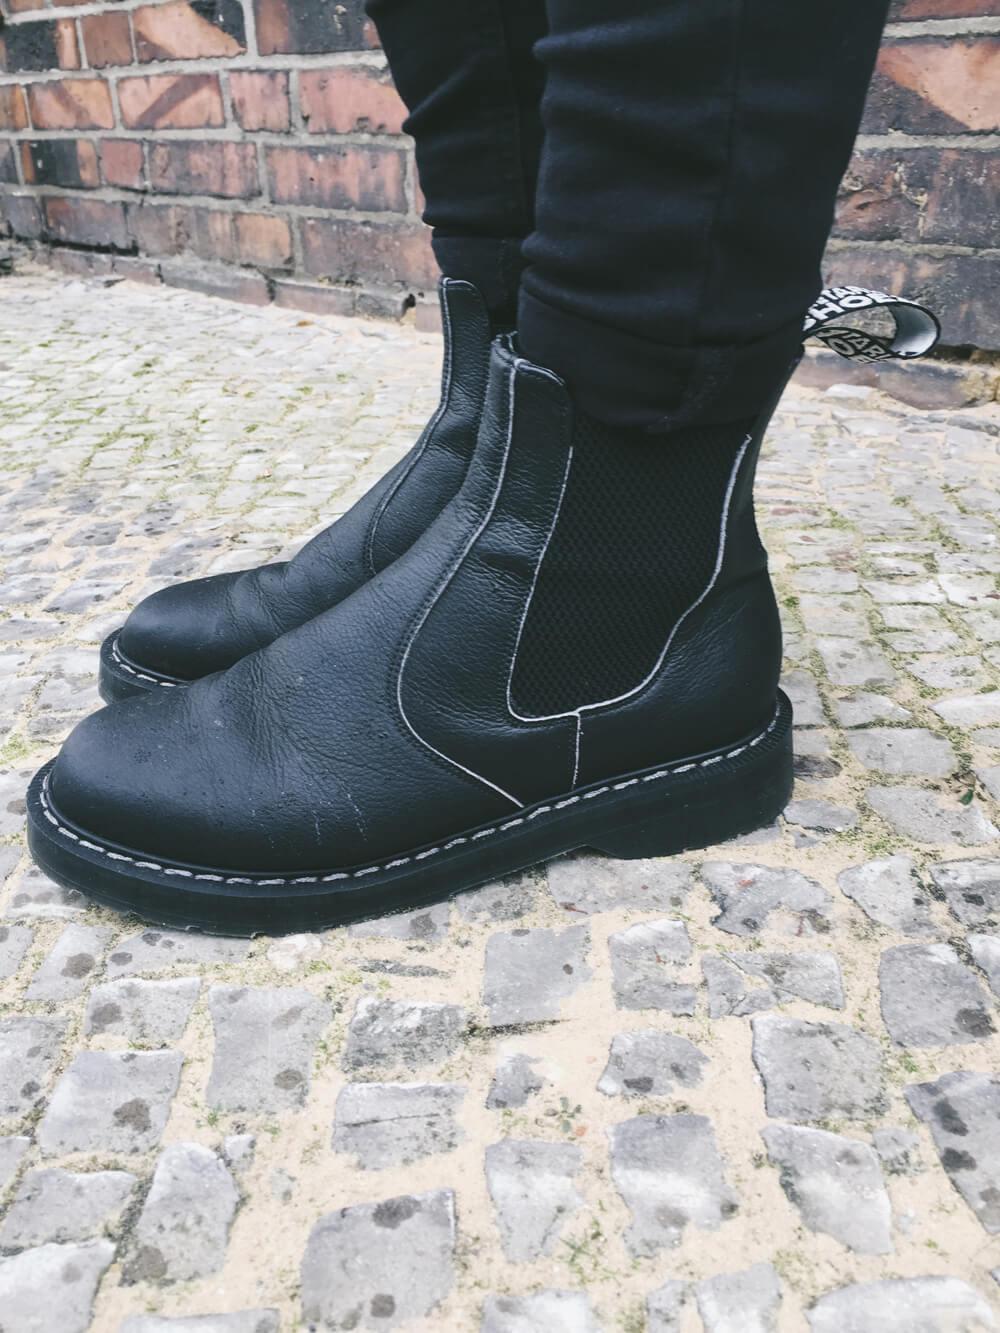 Chelsea Boots von Vegetarian Shoes